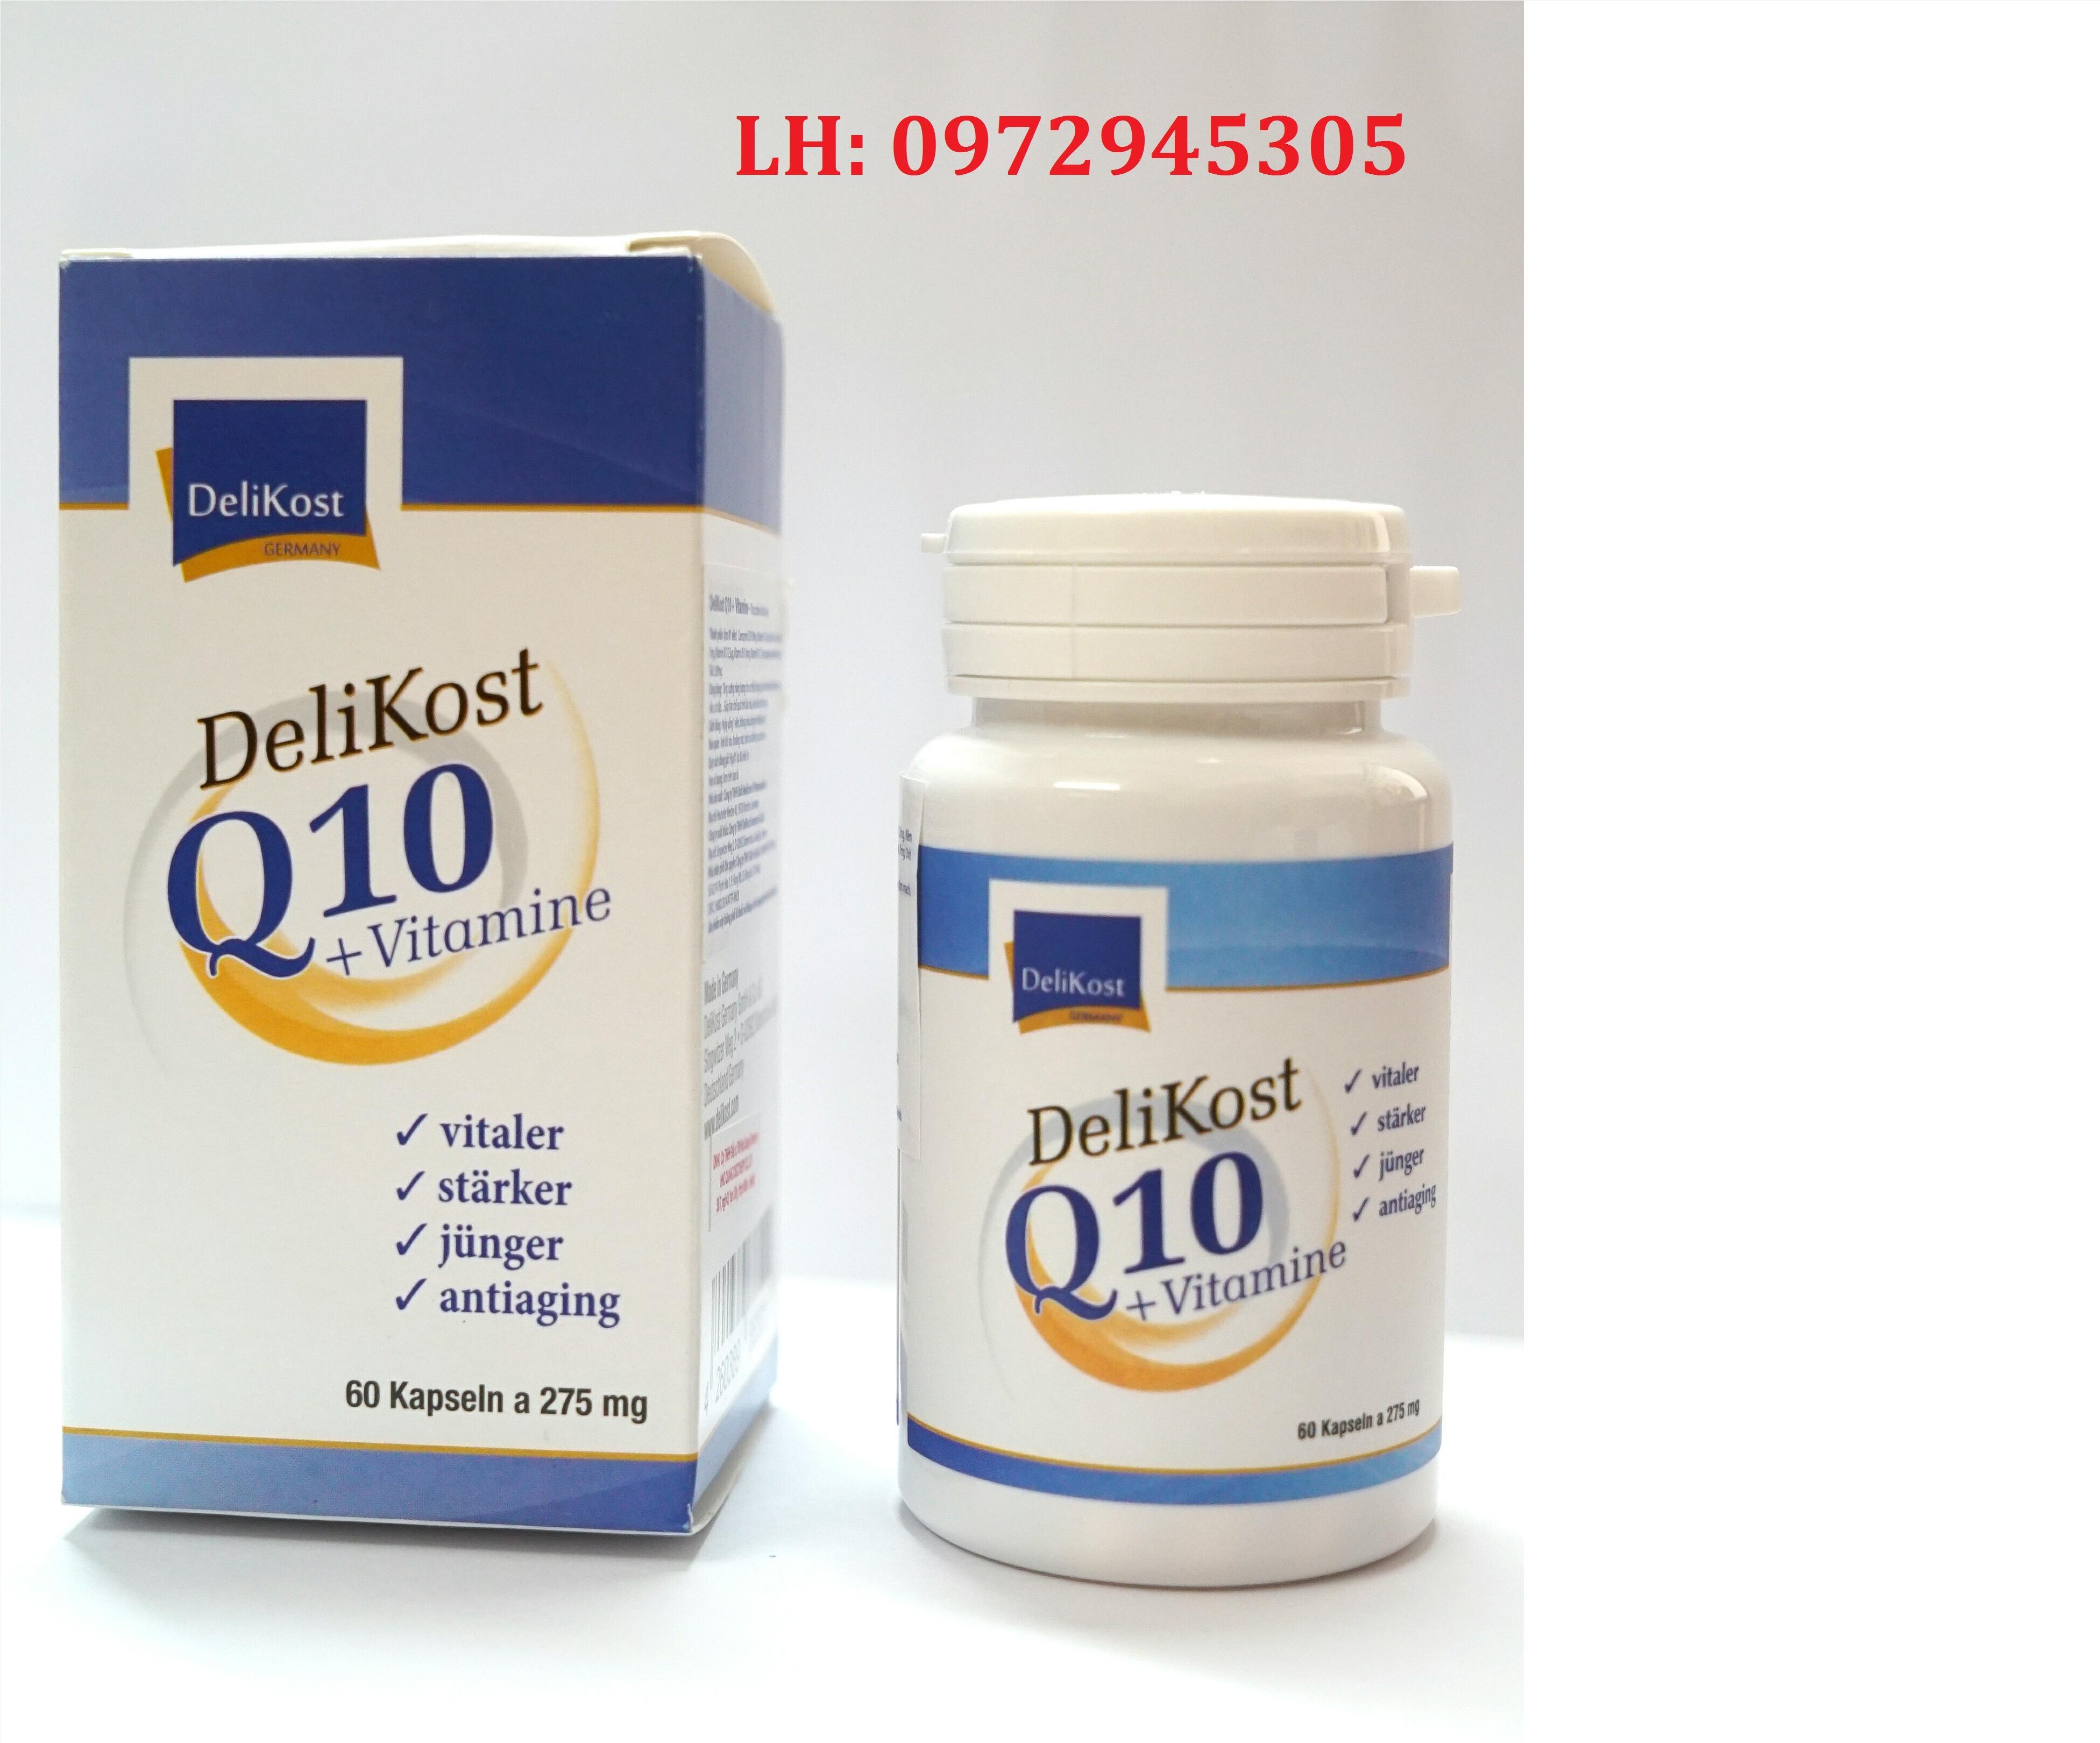 Viên uống bổ sung Delikost Q10 + Vitamine mua ở đâu?